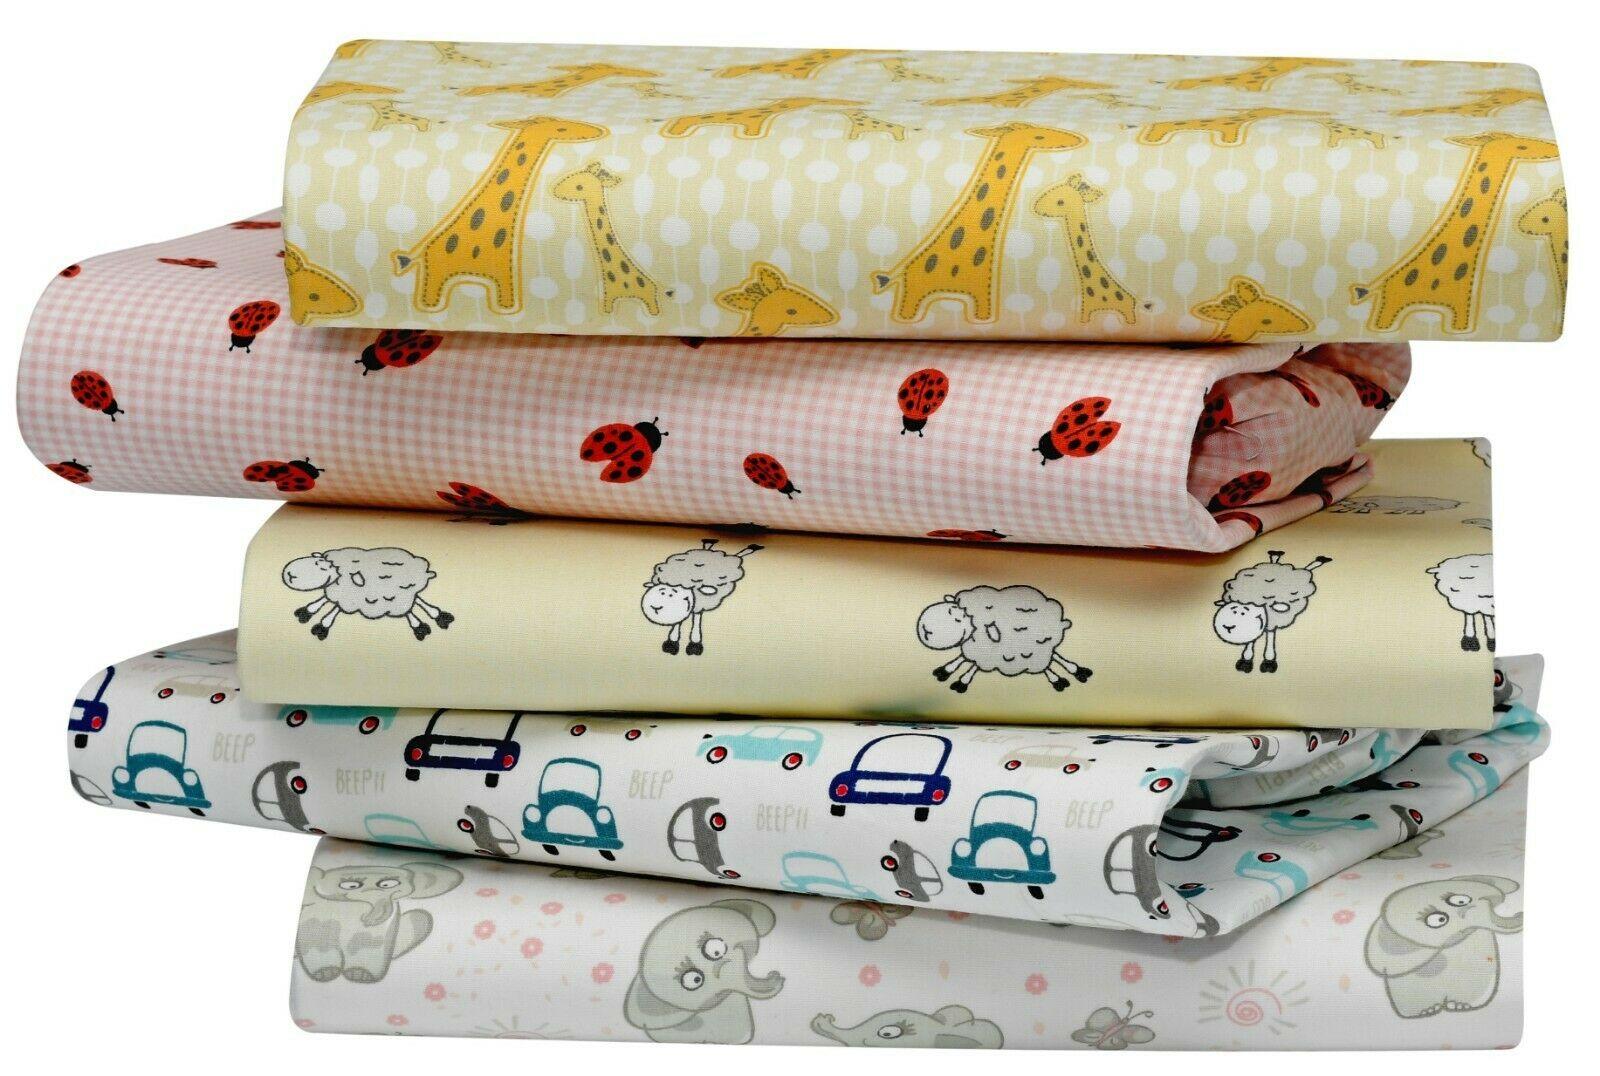 Giraffe Cuddles /& Cribs 1 Pack GOTS Certified Organic Cotton Fitted Crib